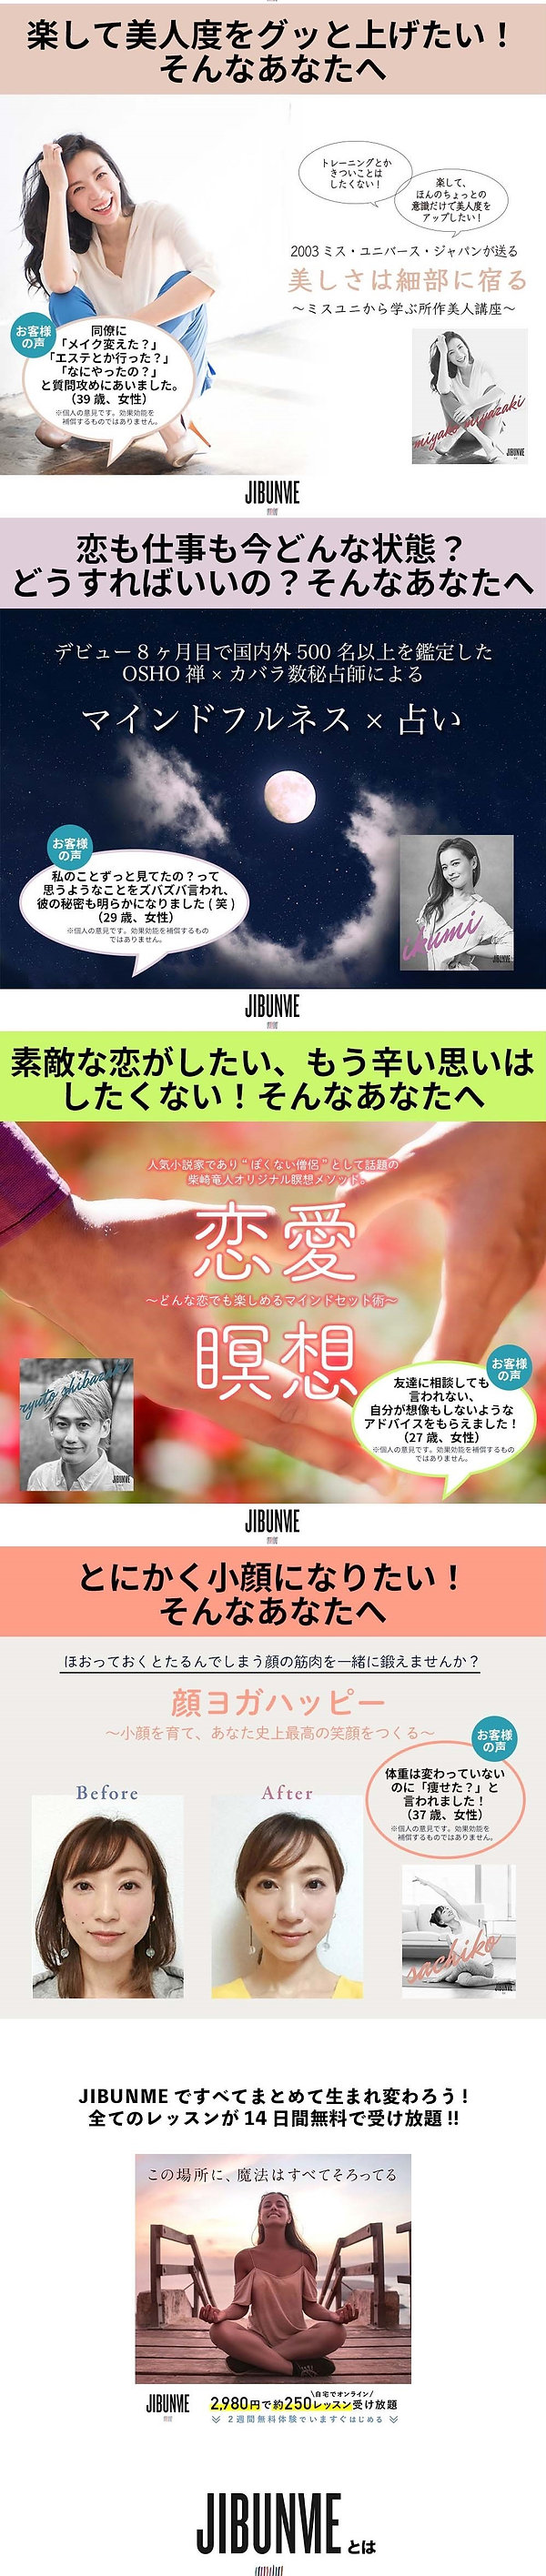 JIBUNME-RMEJ_WEB_083007.jpg